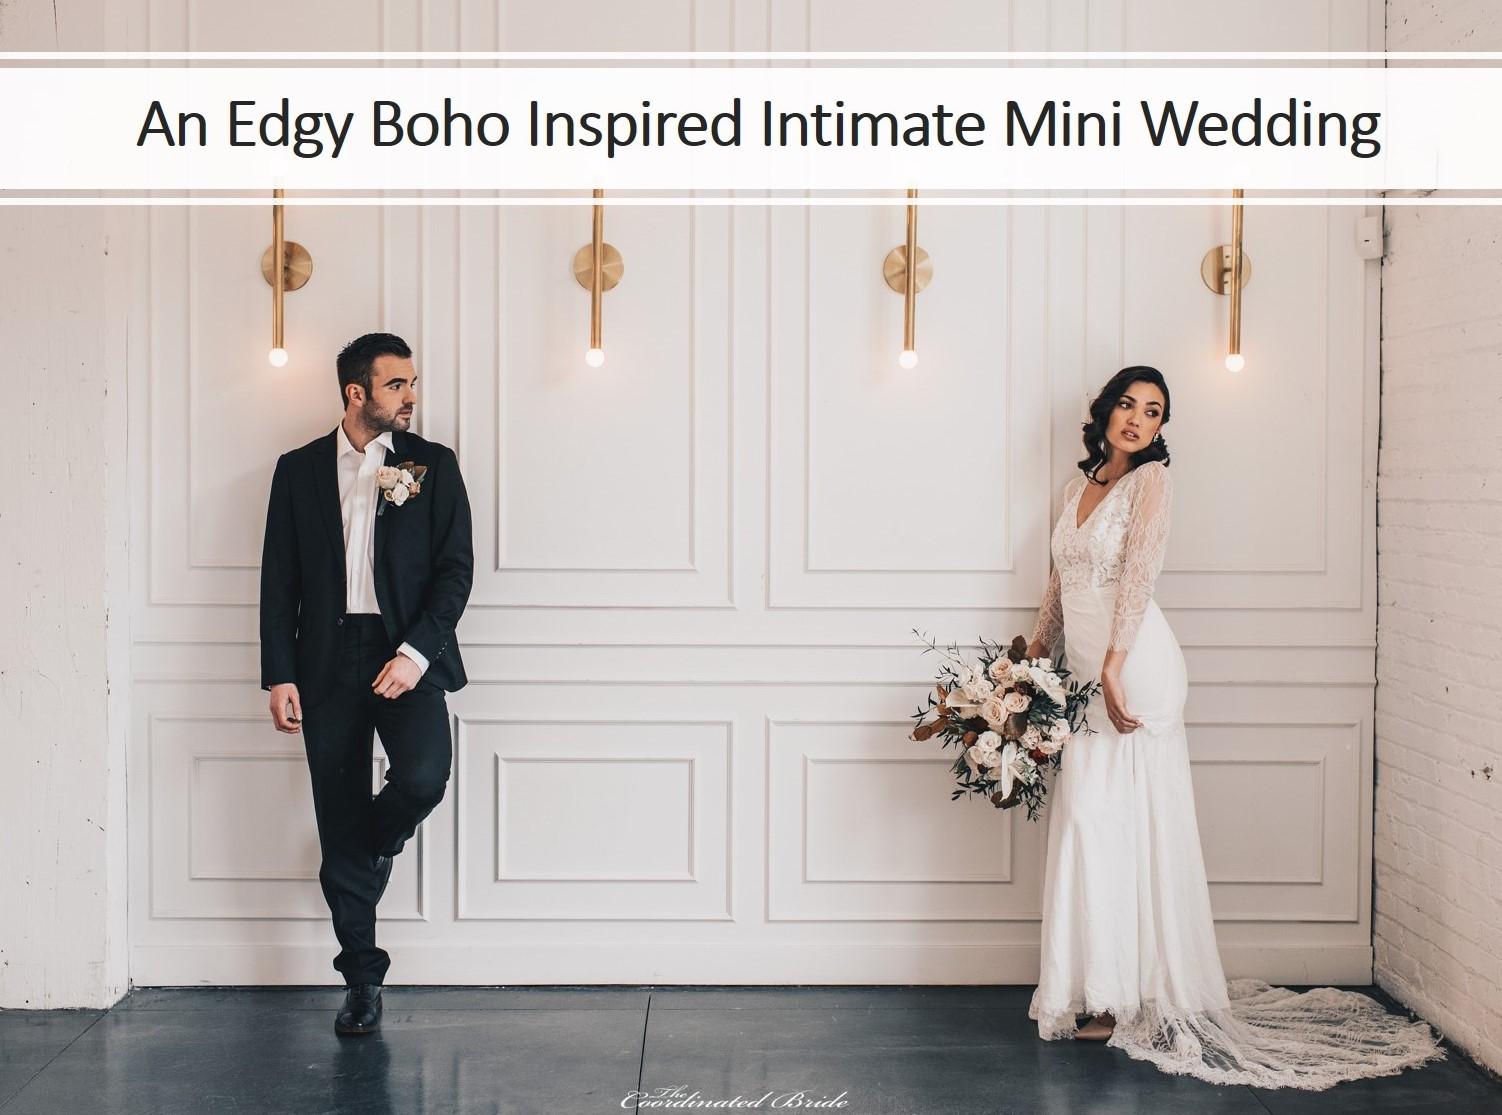 An Edgy Boho Inspired Intimate Mini Wedding Shoot